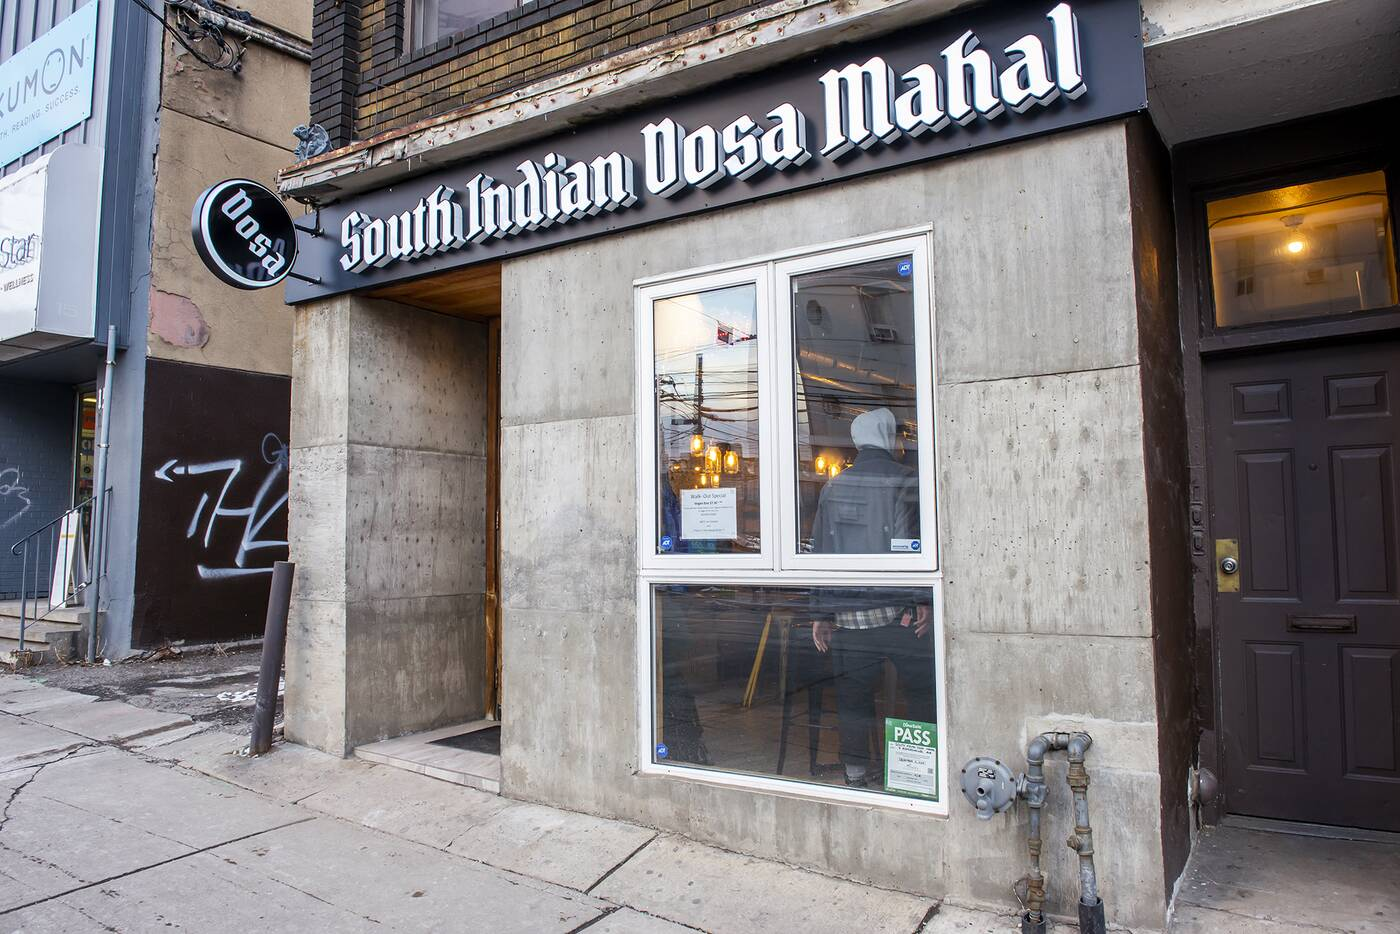 South Indian Dosa Mahal Toronto